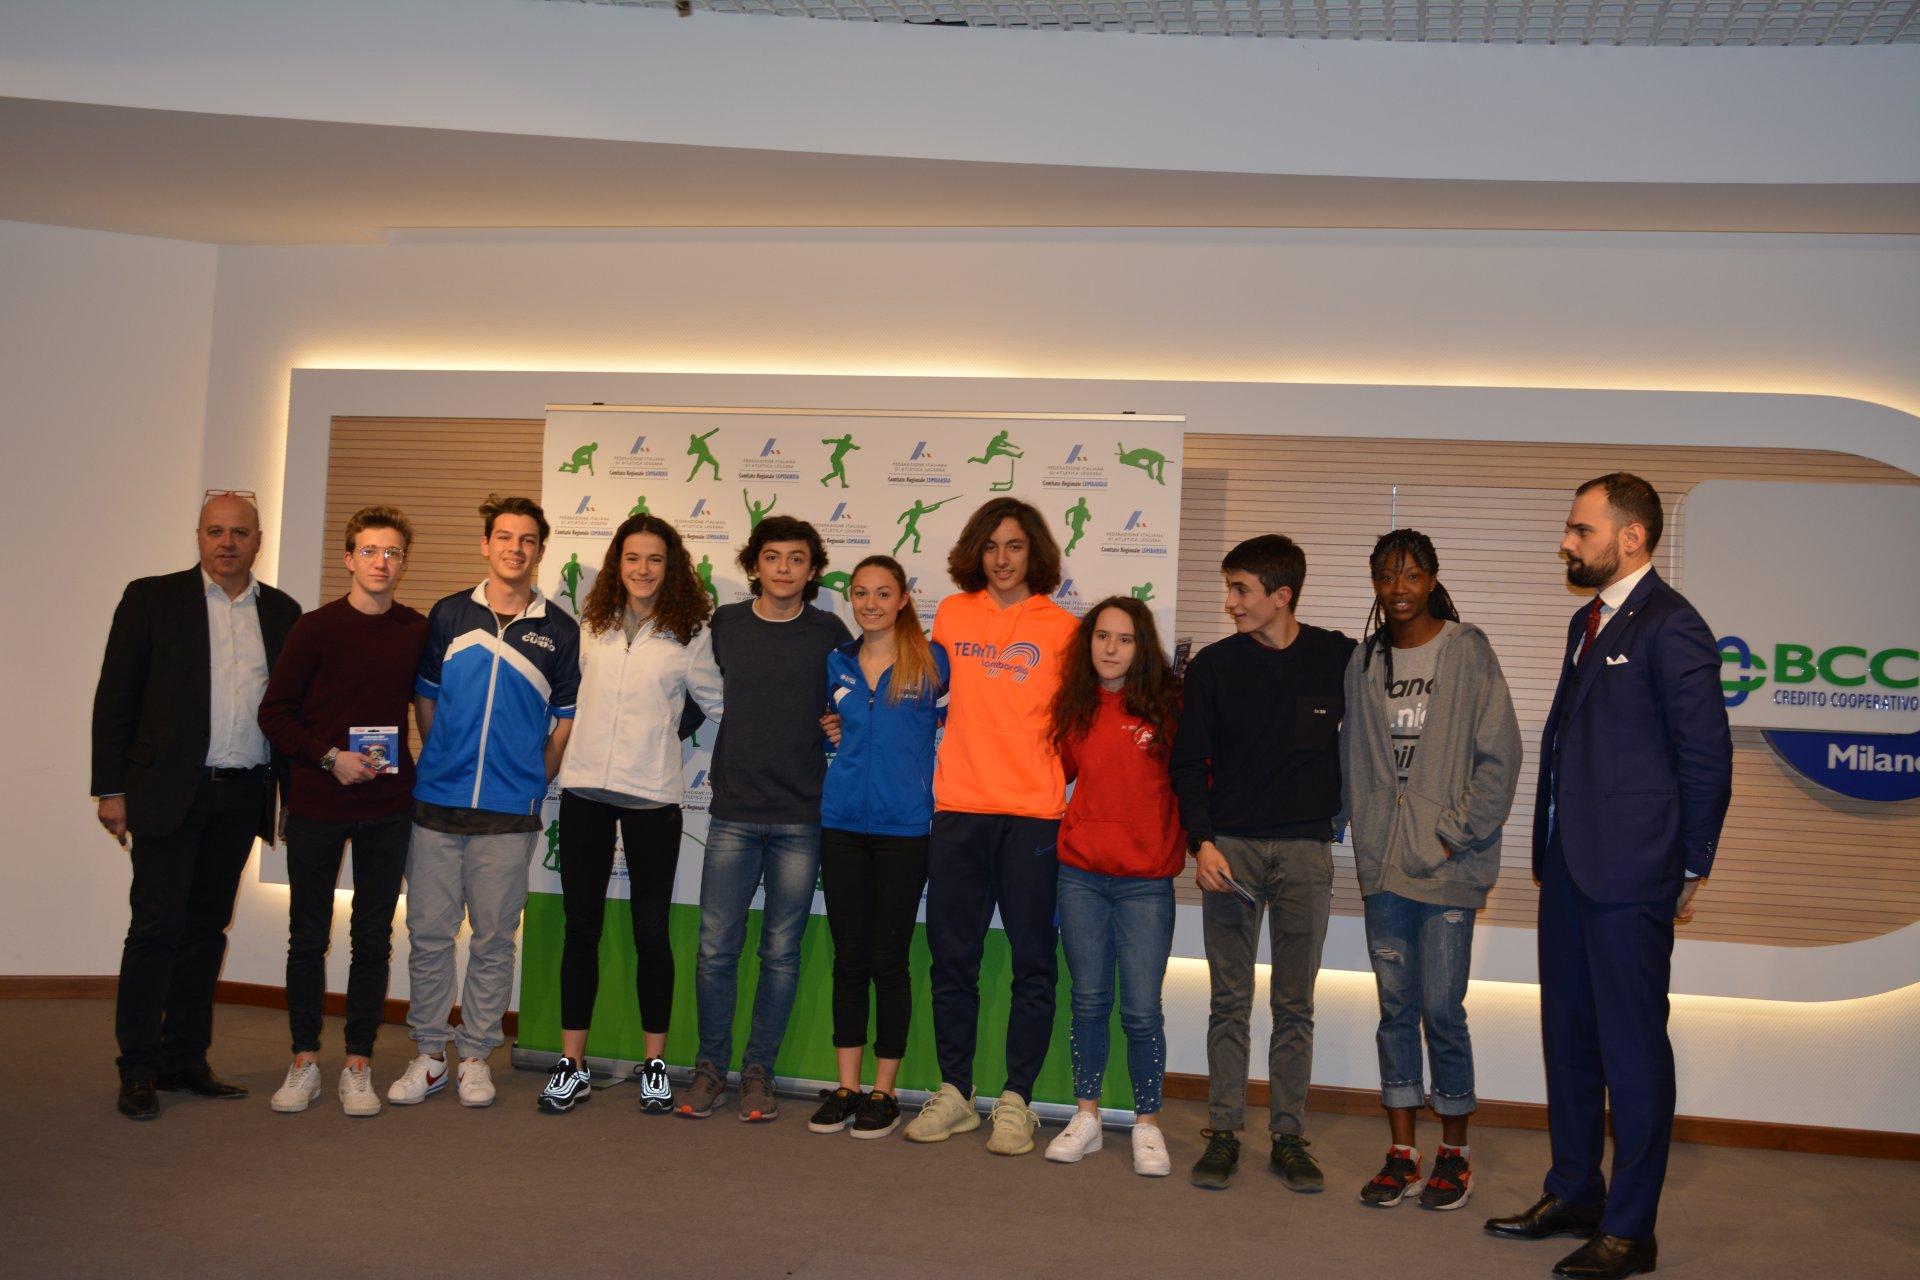 Carugate festa Fidal atletica leggera Lombardia